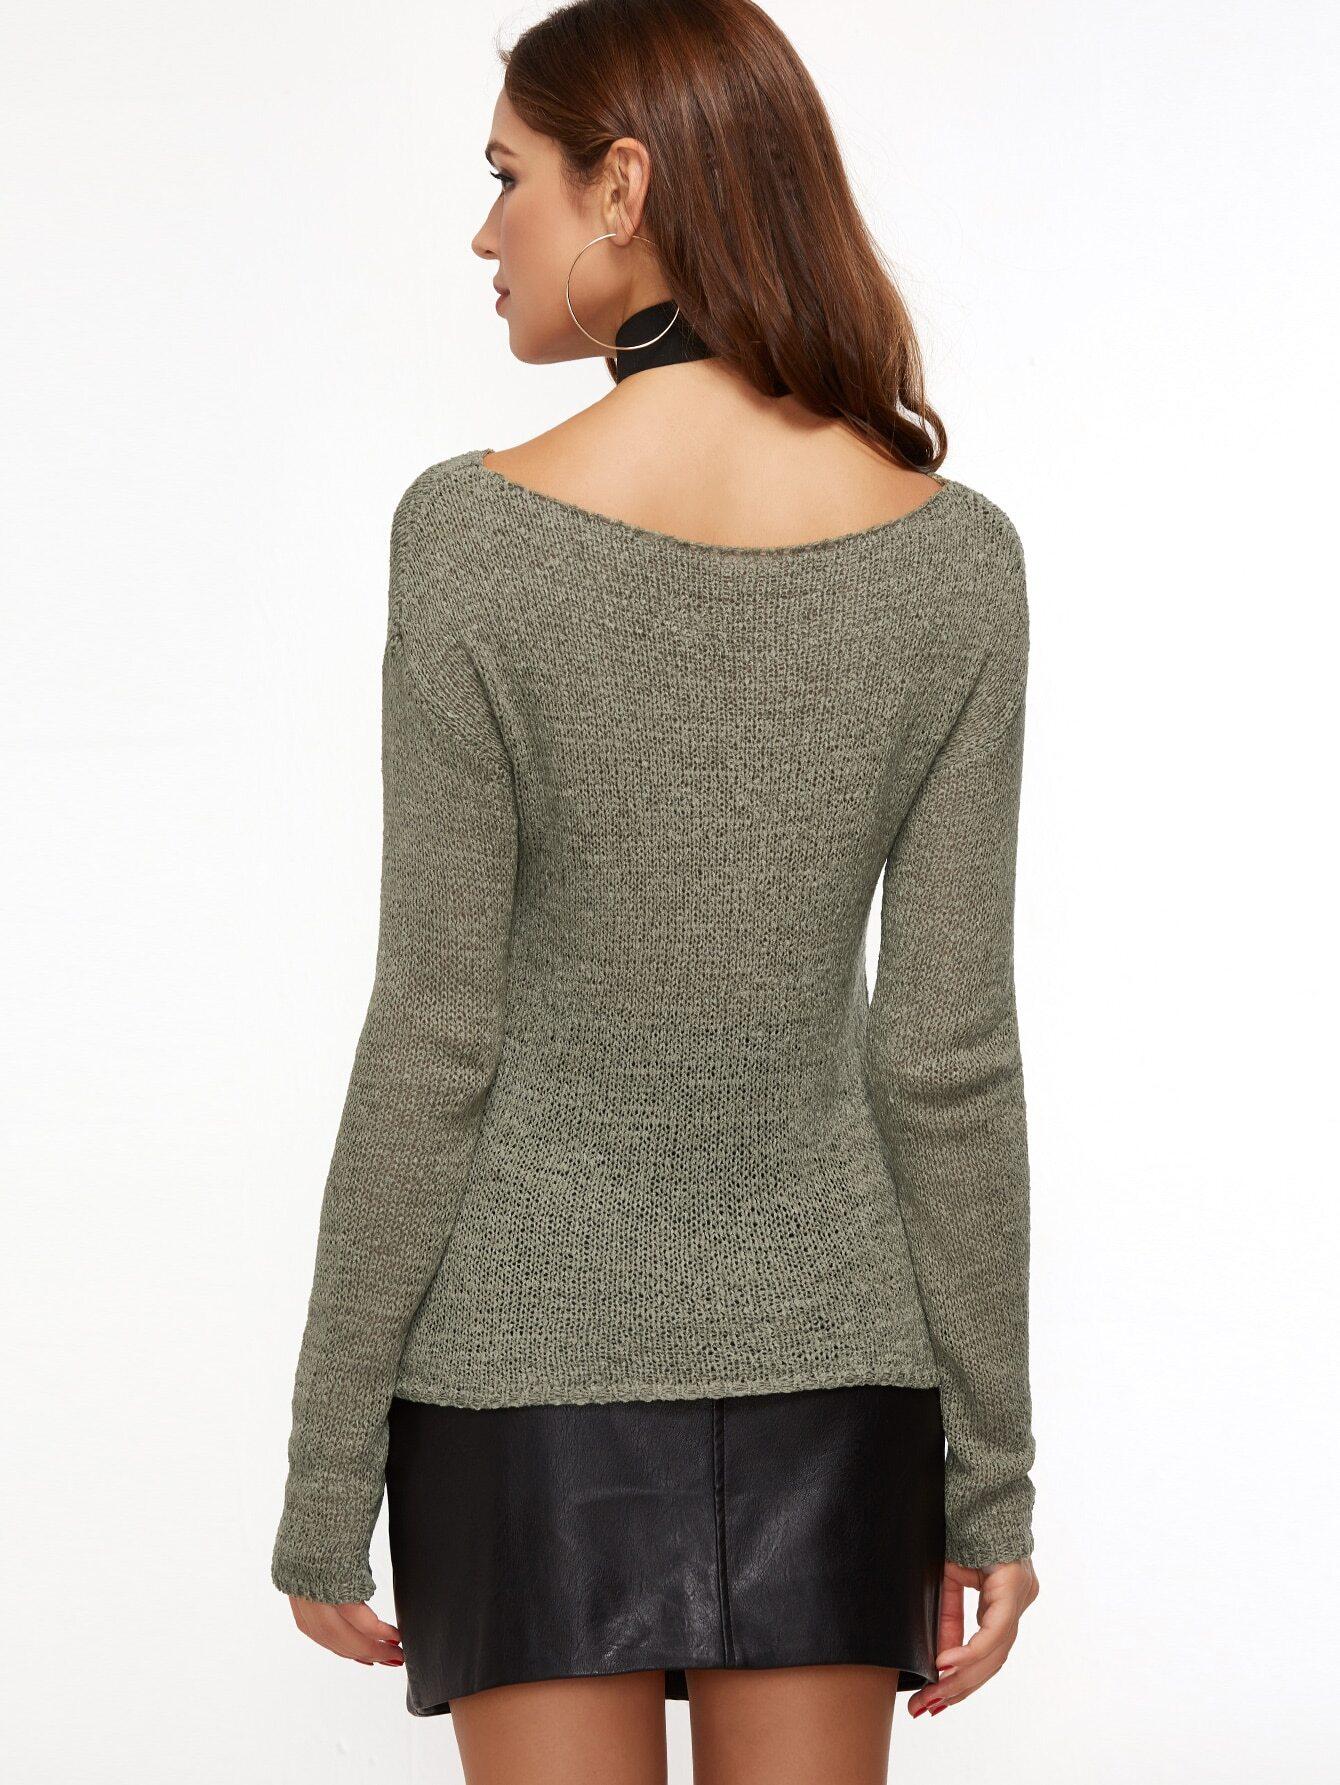 sweater161107451_2